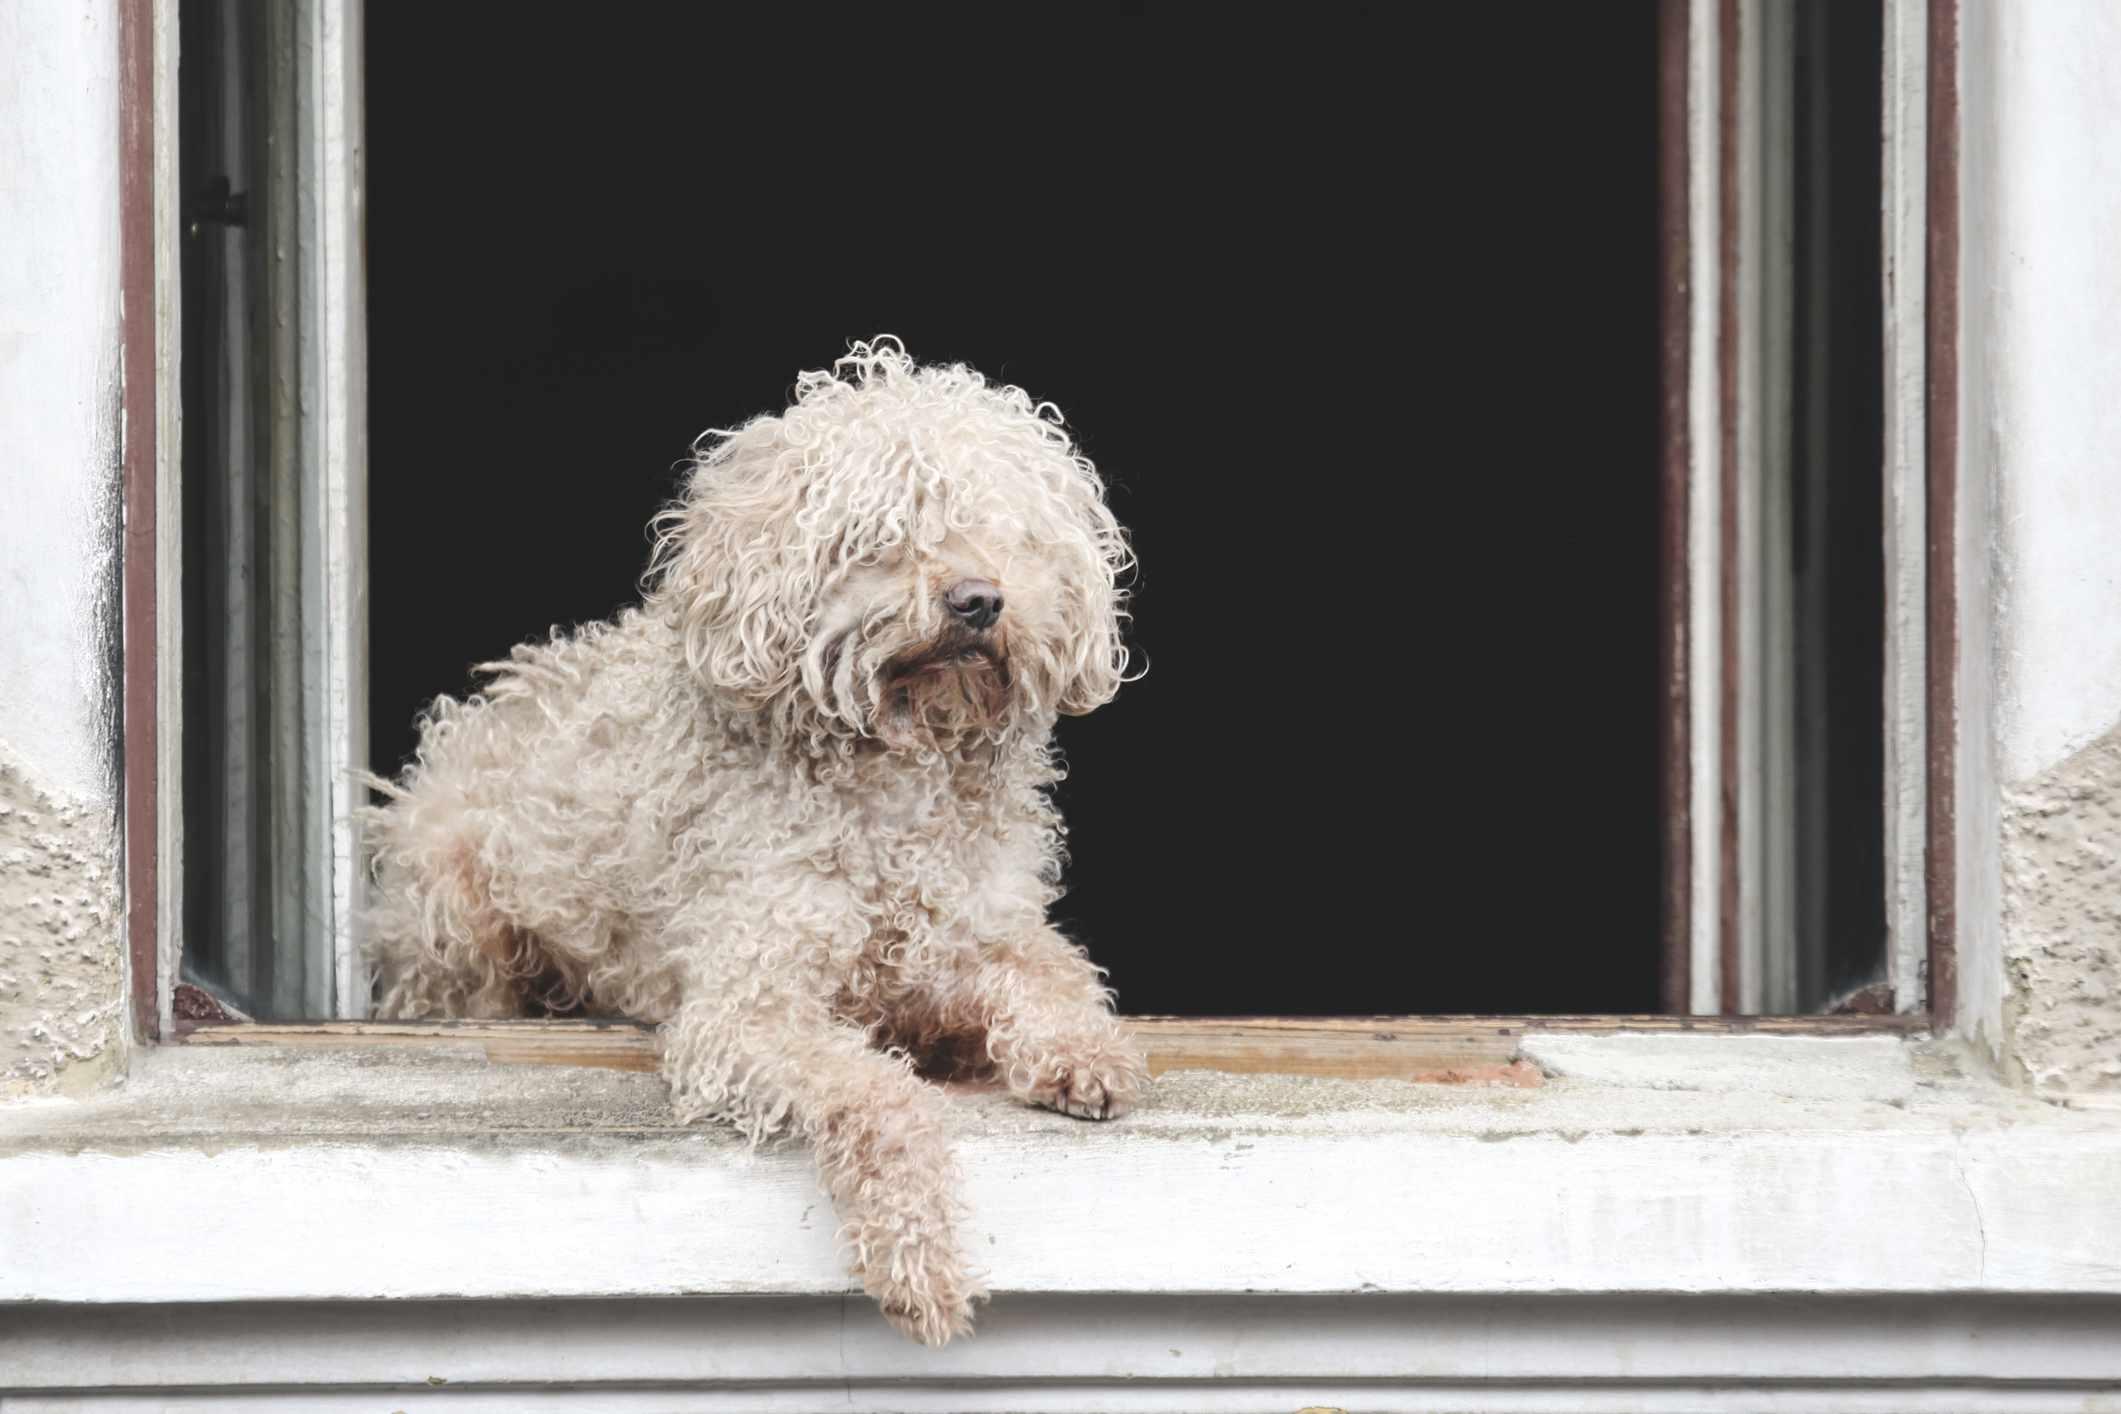 White puli dog sitting